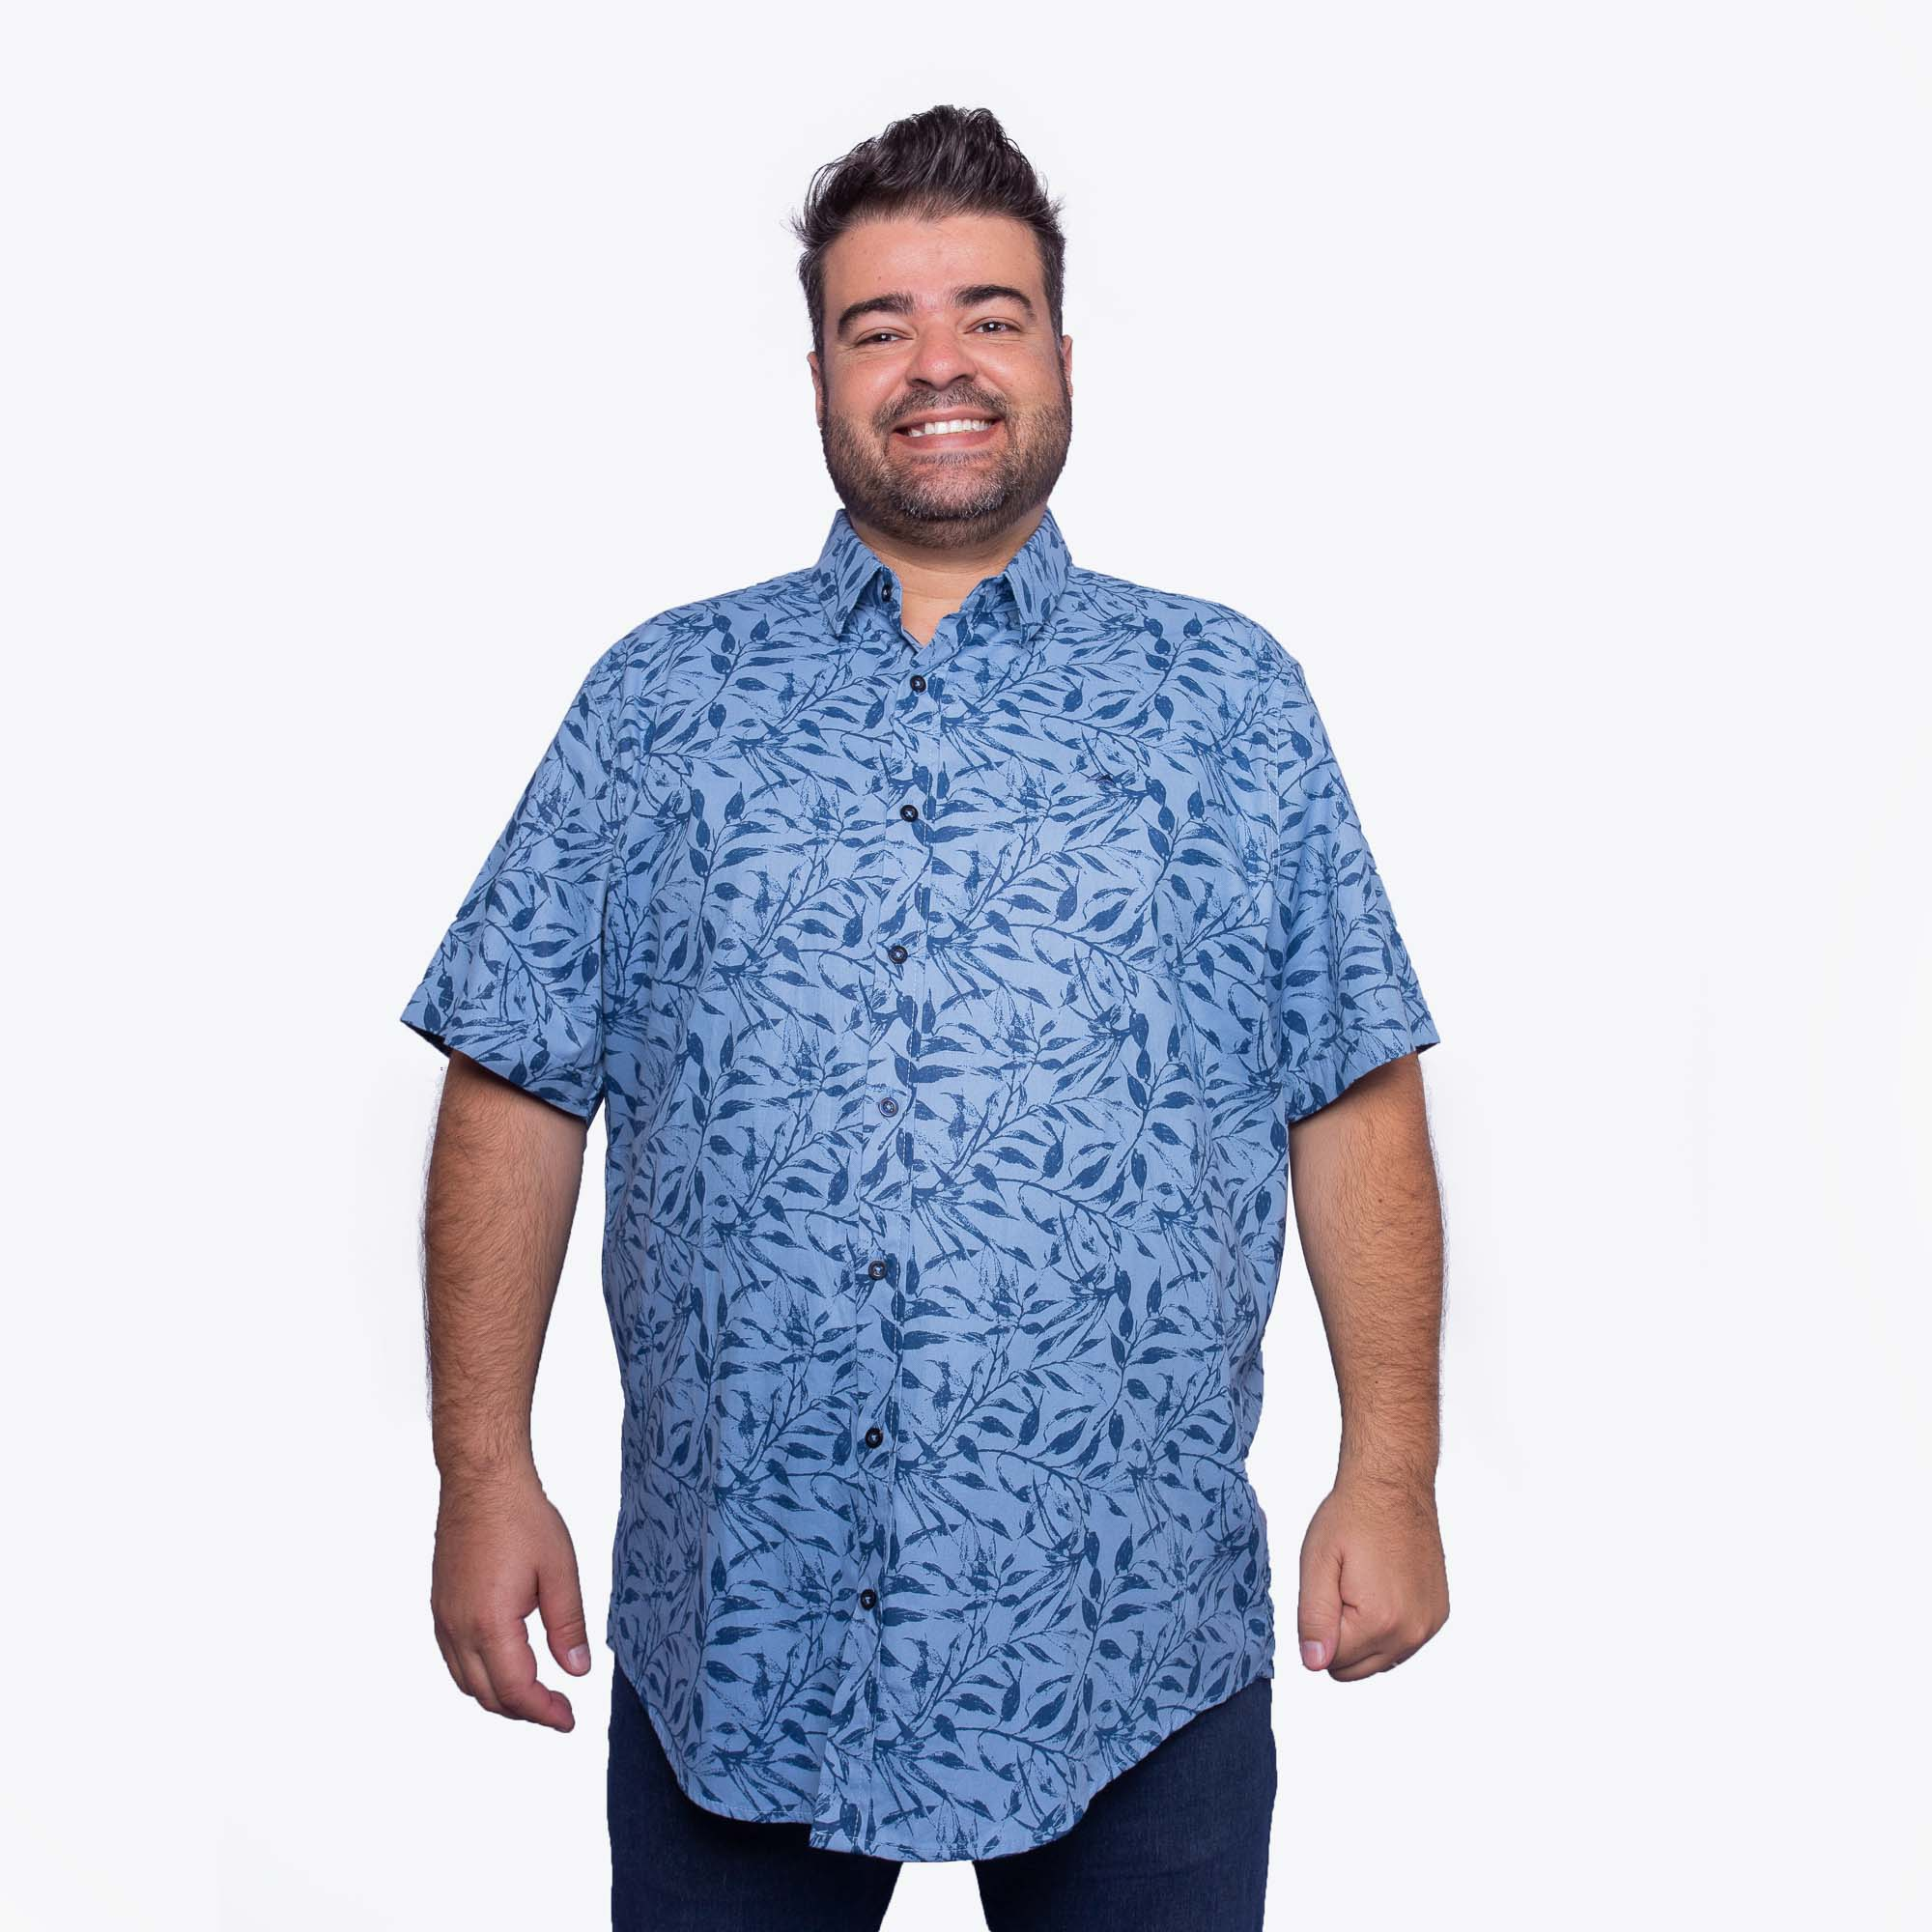 Camisa Masculina Plus Size Azul Floral - MX-72